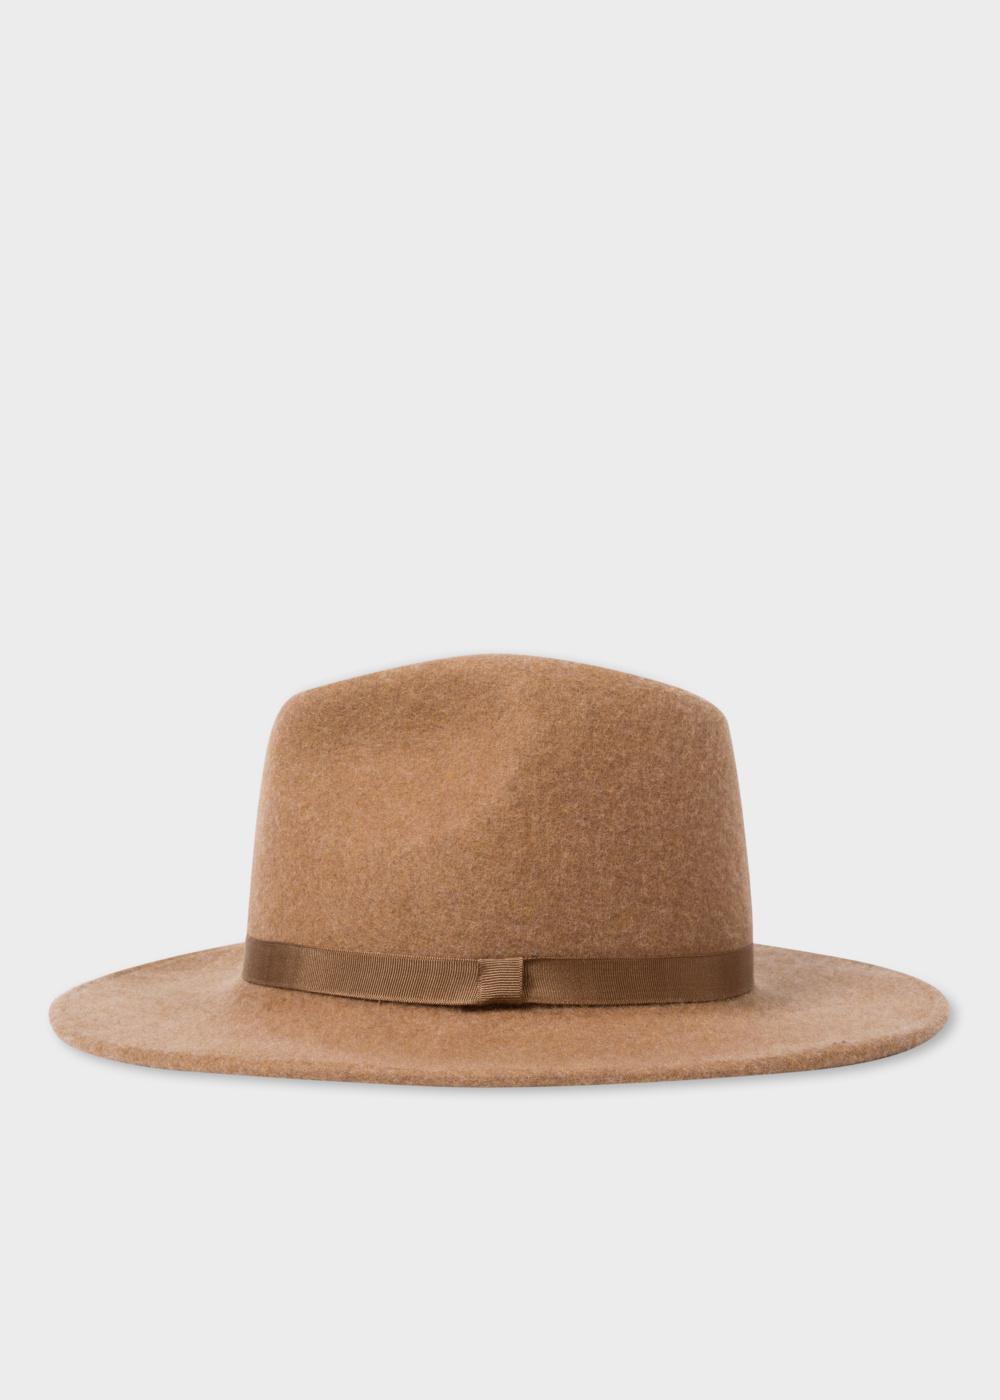 3d6867f21e37c5 Paul Smith Women's Tan Lined Wool Fedora Hat in Brown - Lyst